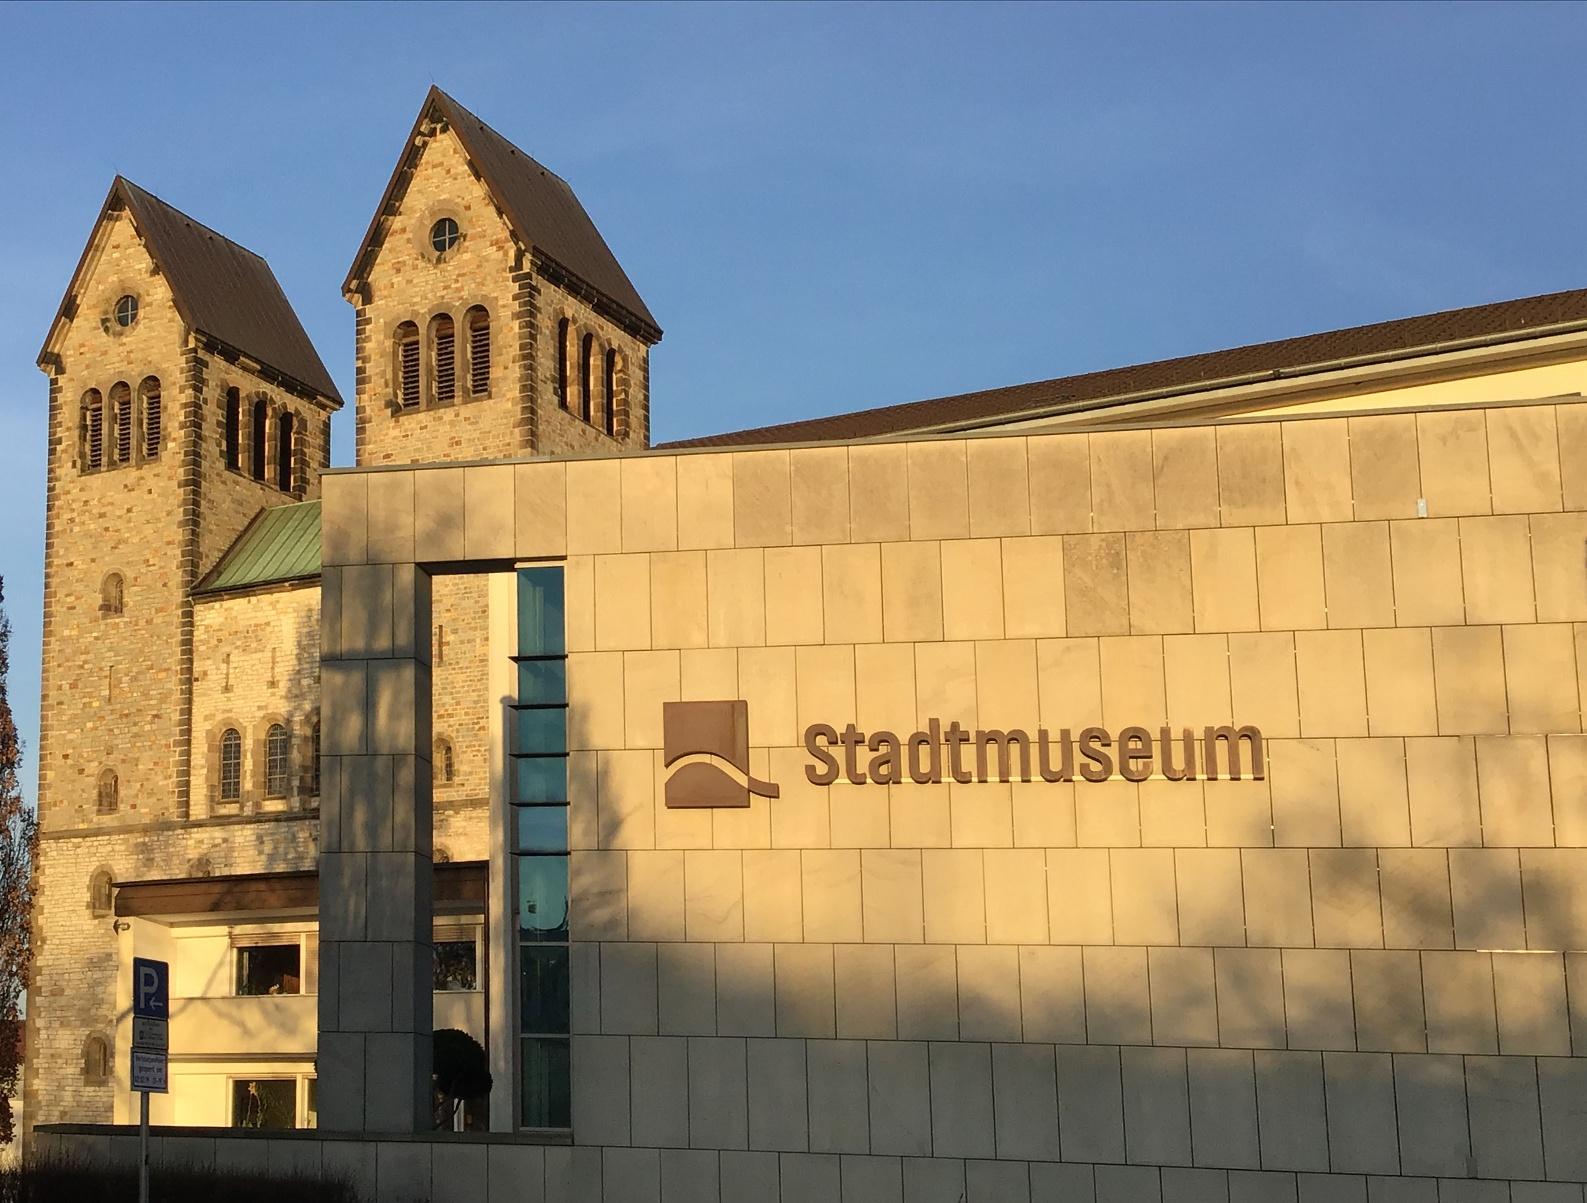 Stadtmuseum mit Abdinghofkirche